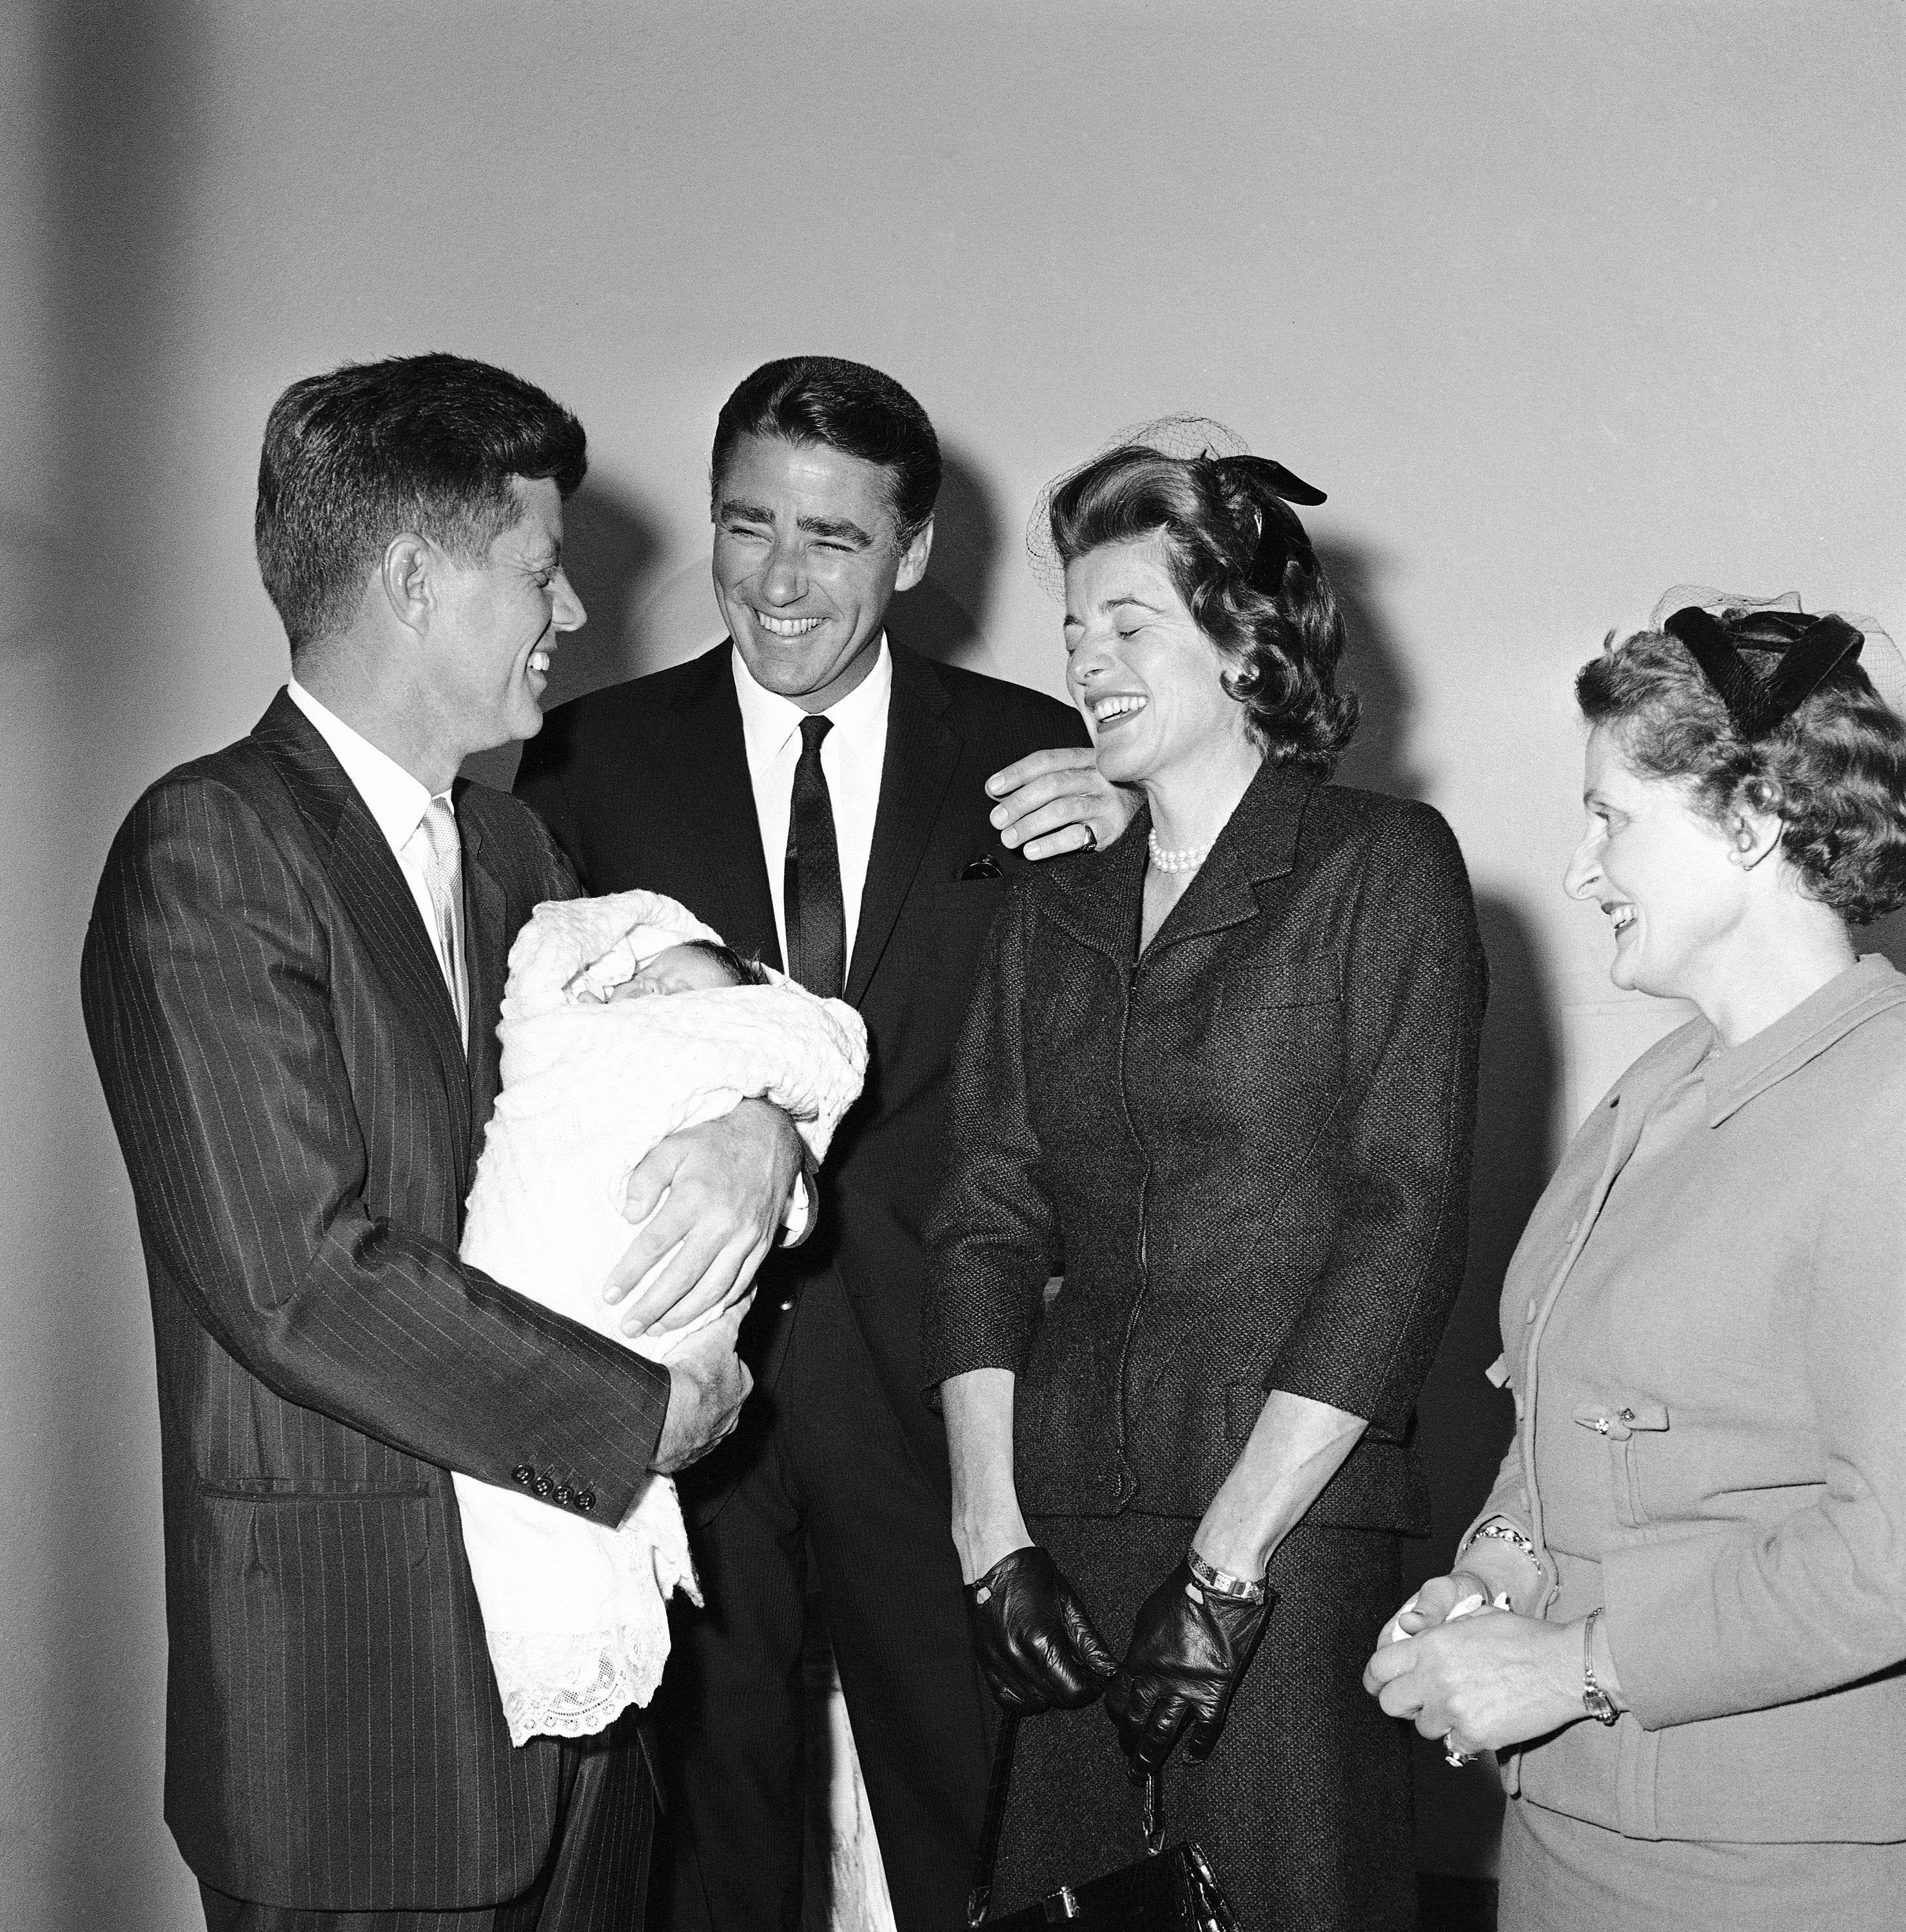 Errol Flynn (1909?959 (born in Tasmania and later naturalized American citizen) photo